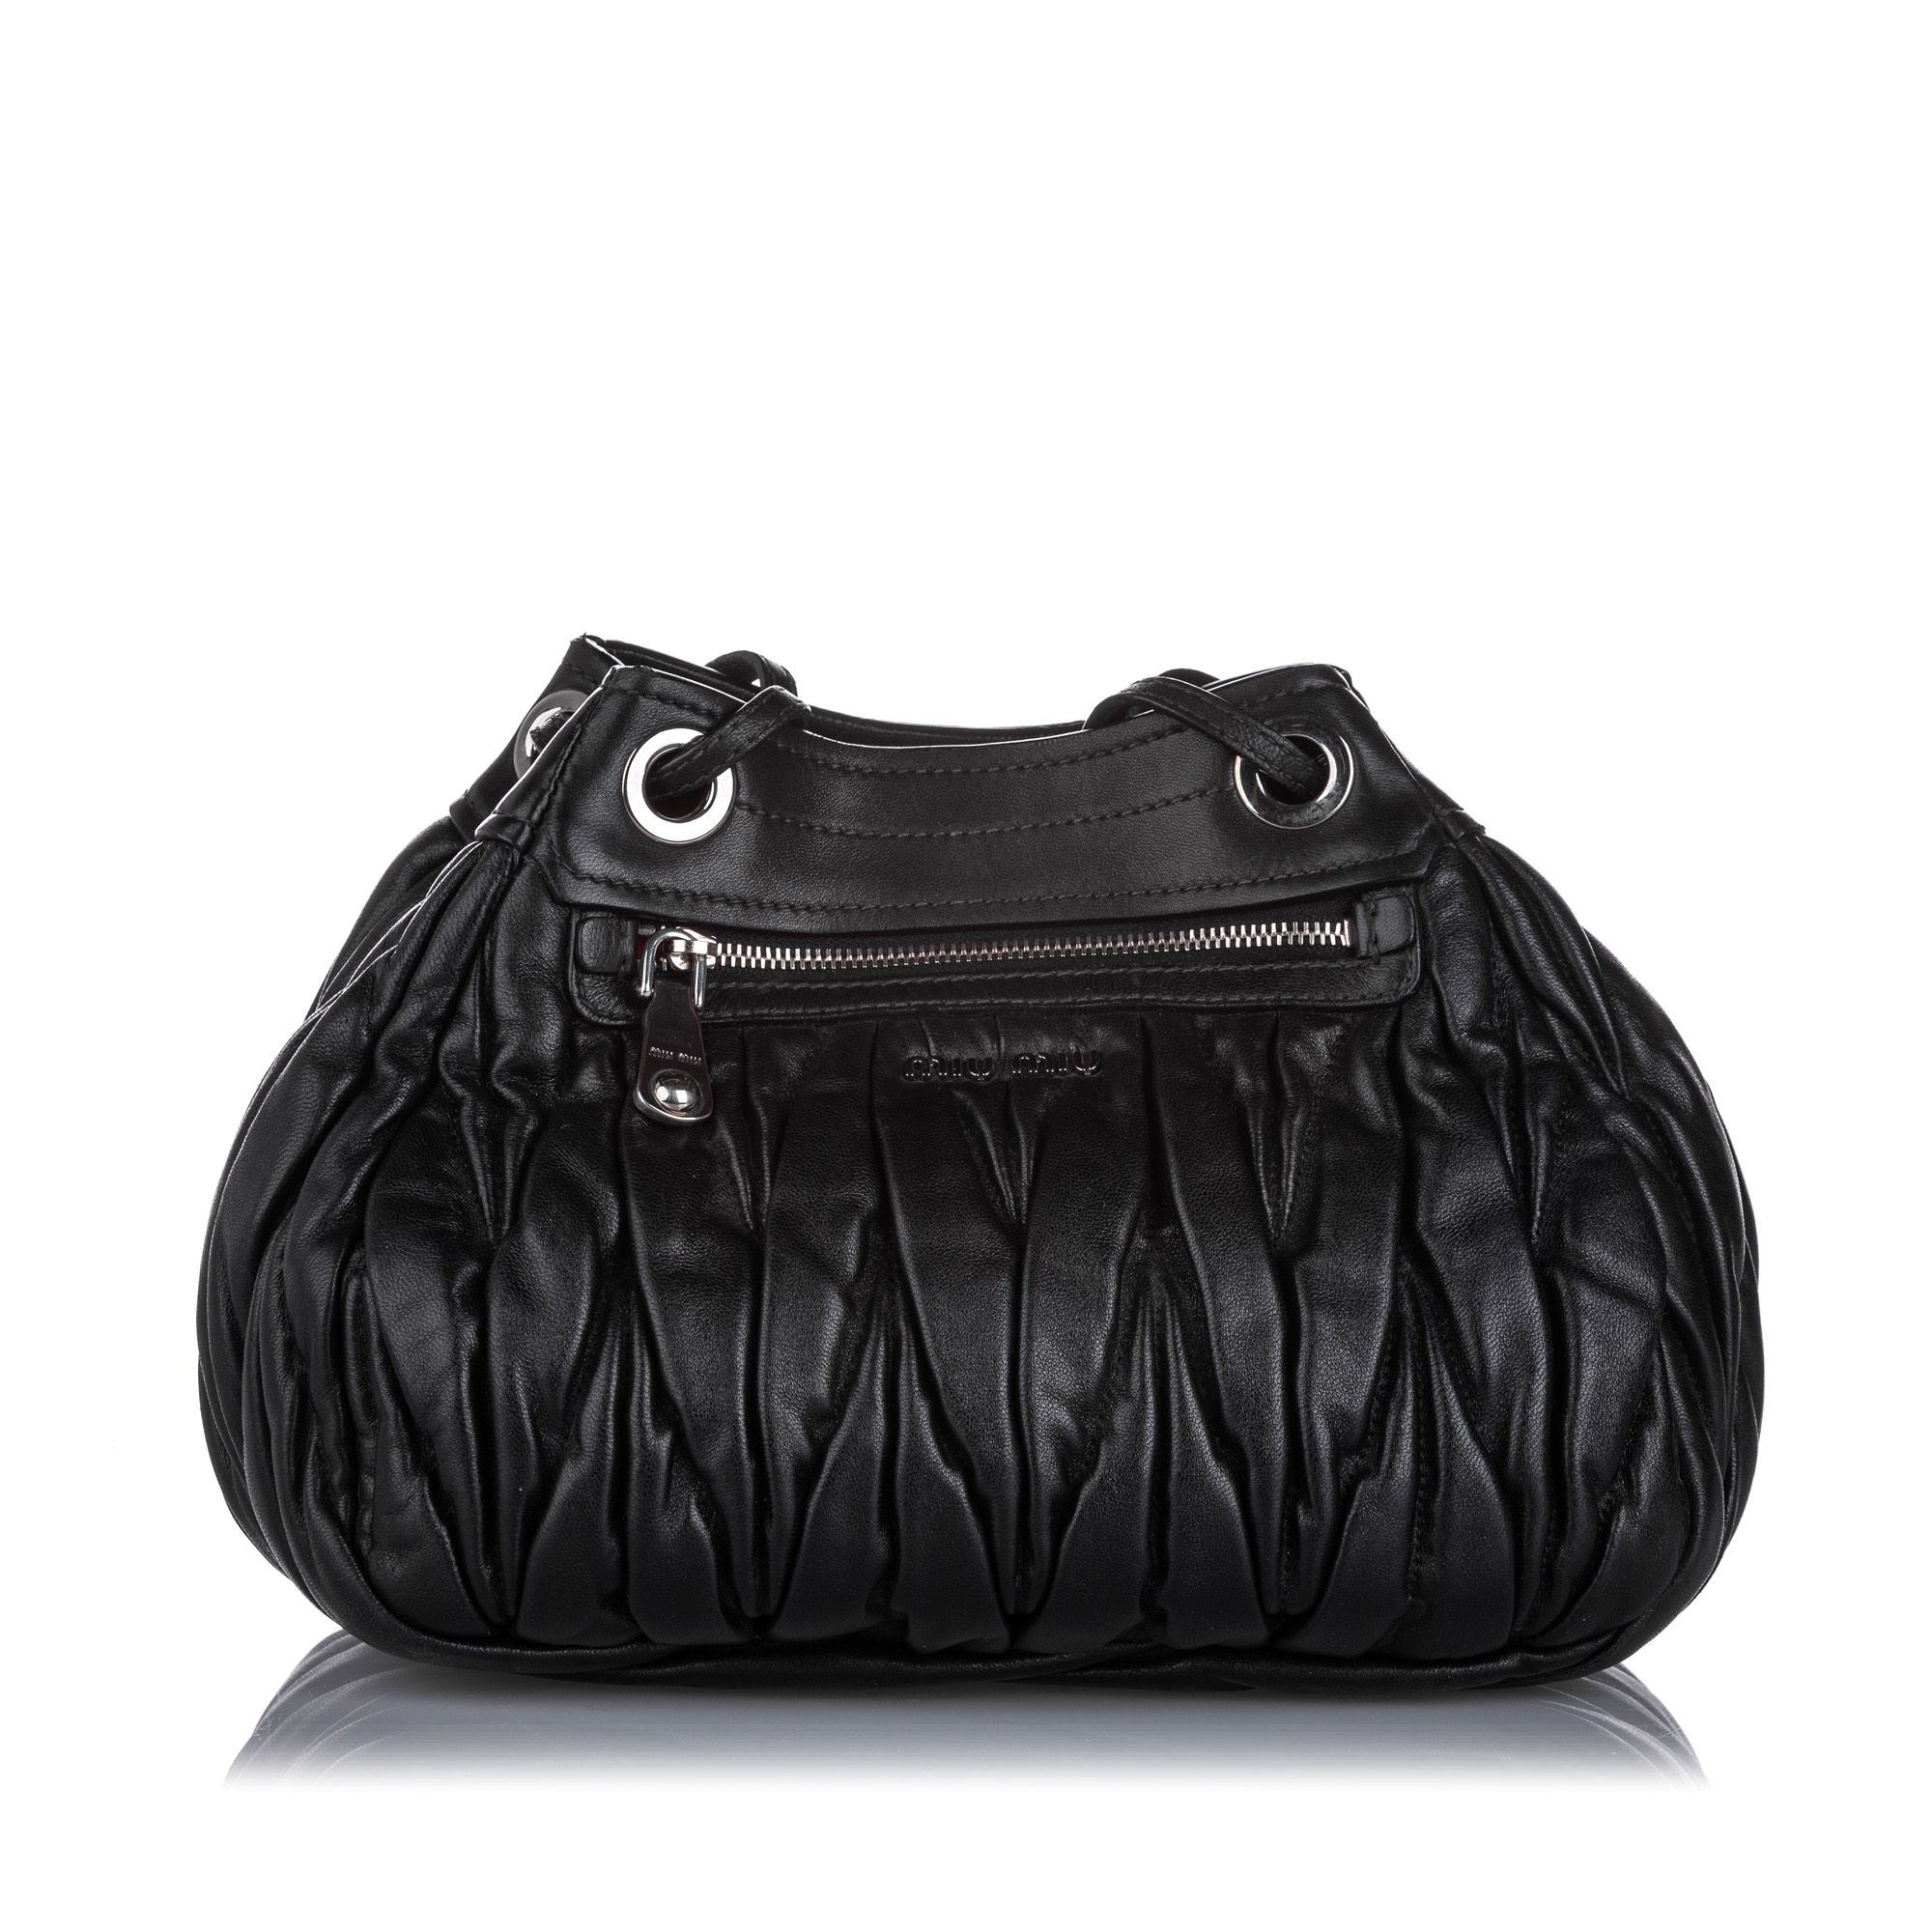 Vintage Miu Miu Matelasse Leather Crossbody Bag Black